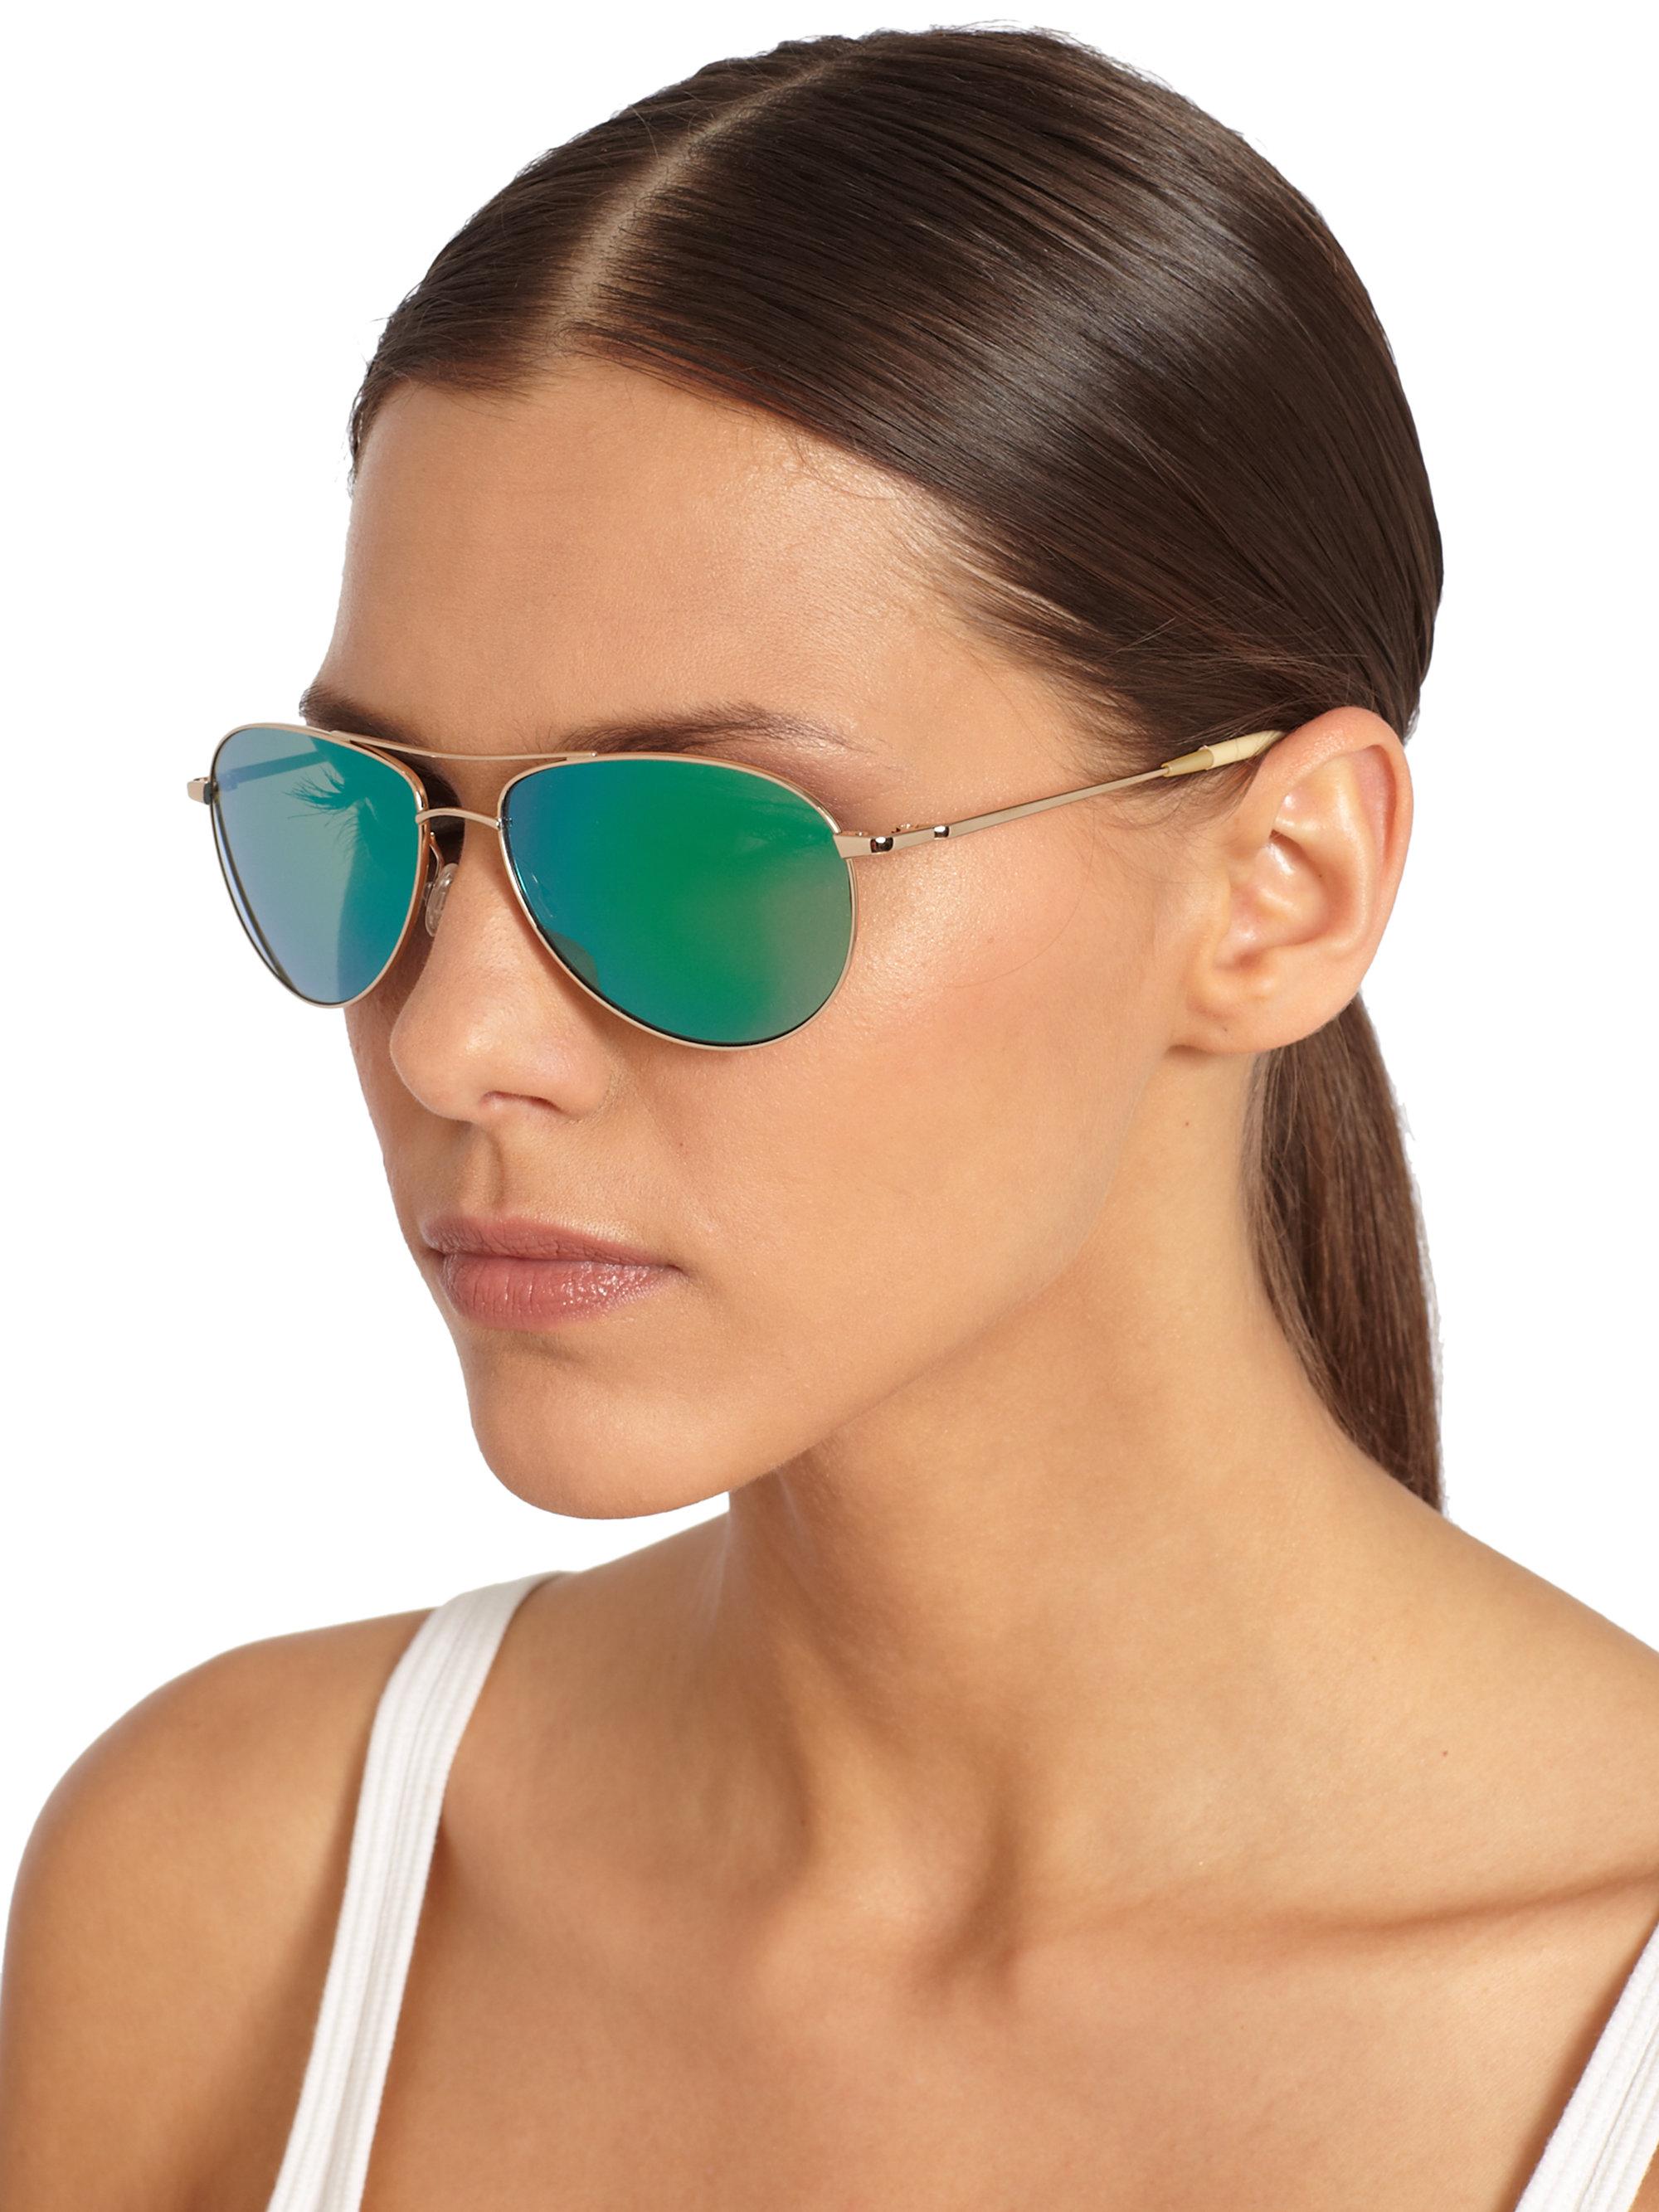 Peoples 59 Benedict Sunglassesgreen Mirror Oliver Aviator 1FKlJc